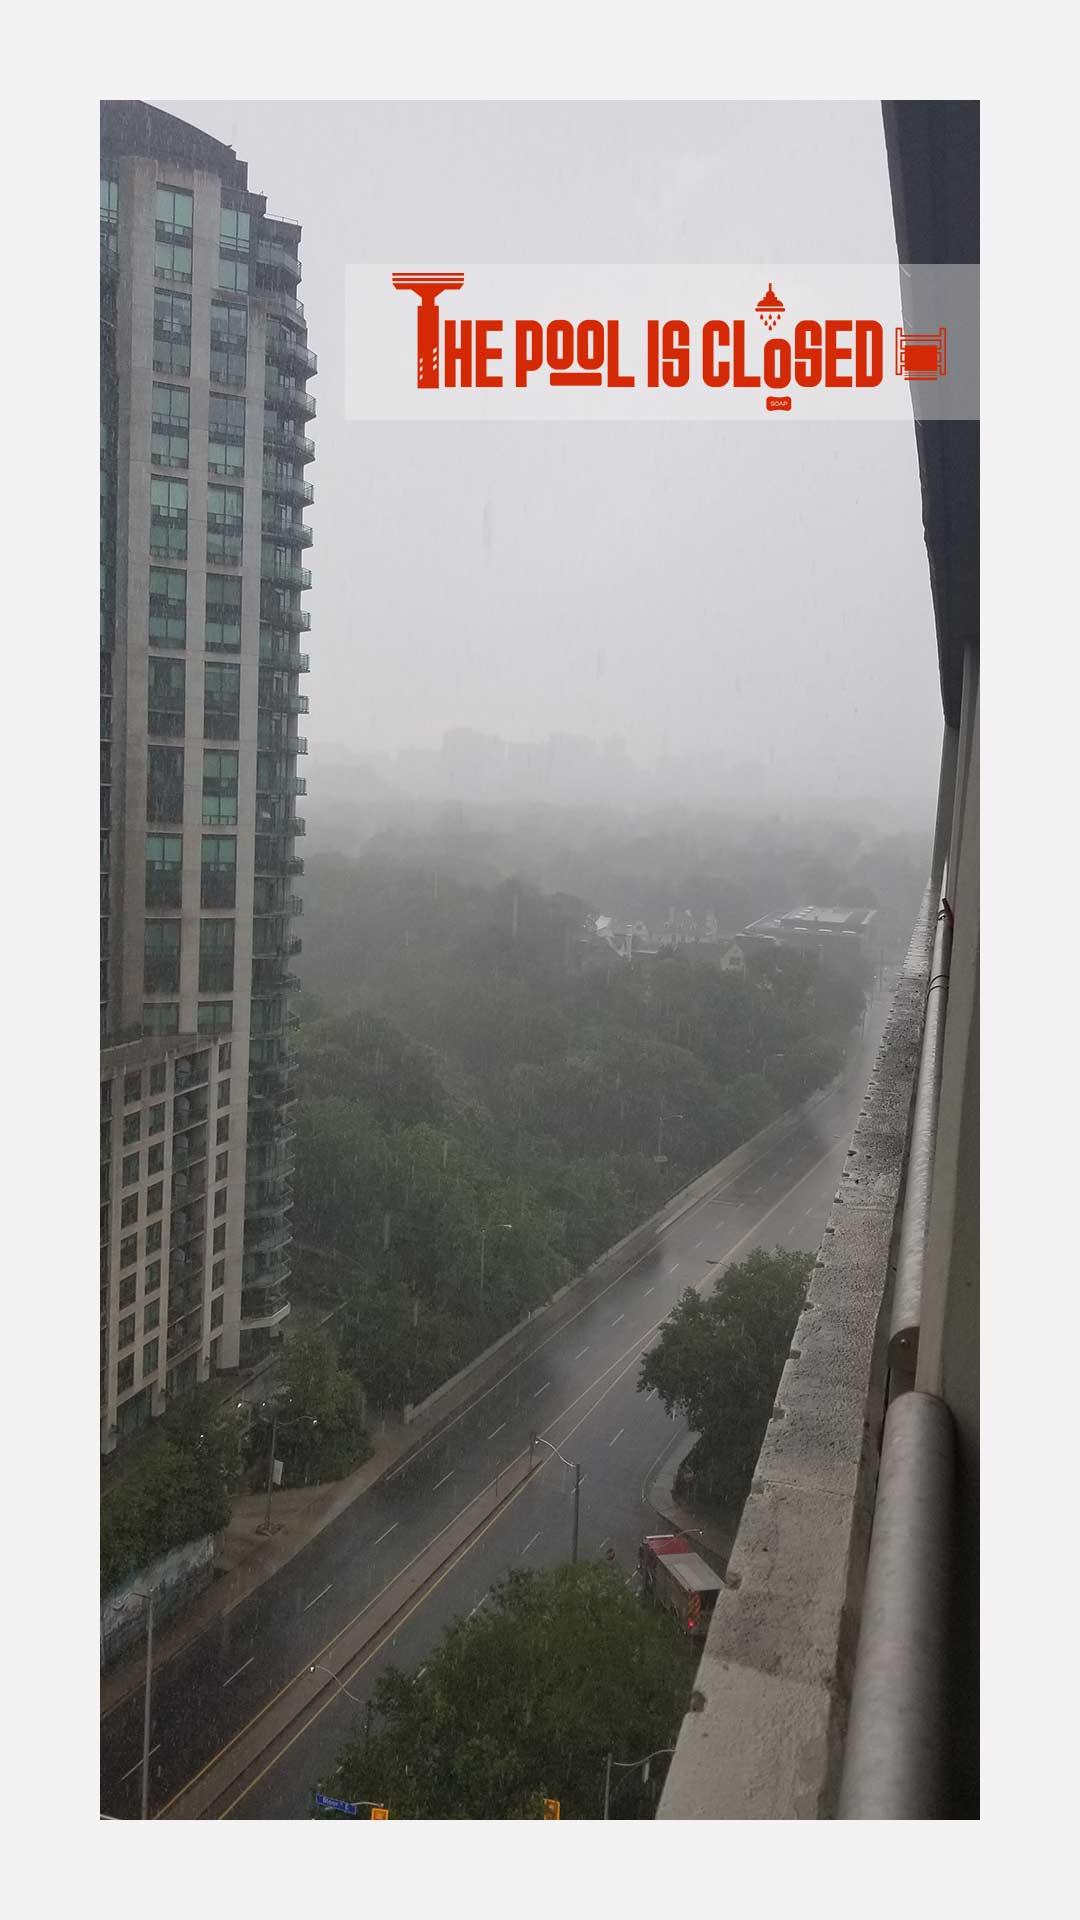 RAIN STORM IN TORONTO - TURNIPSTYLE.COM